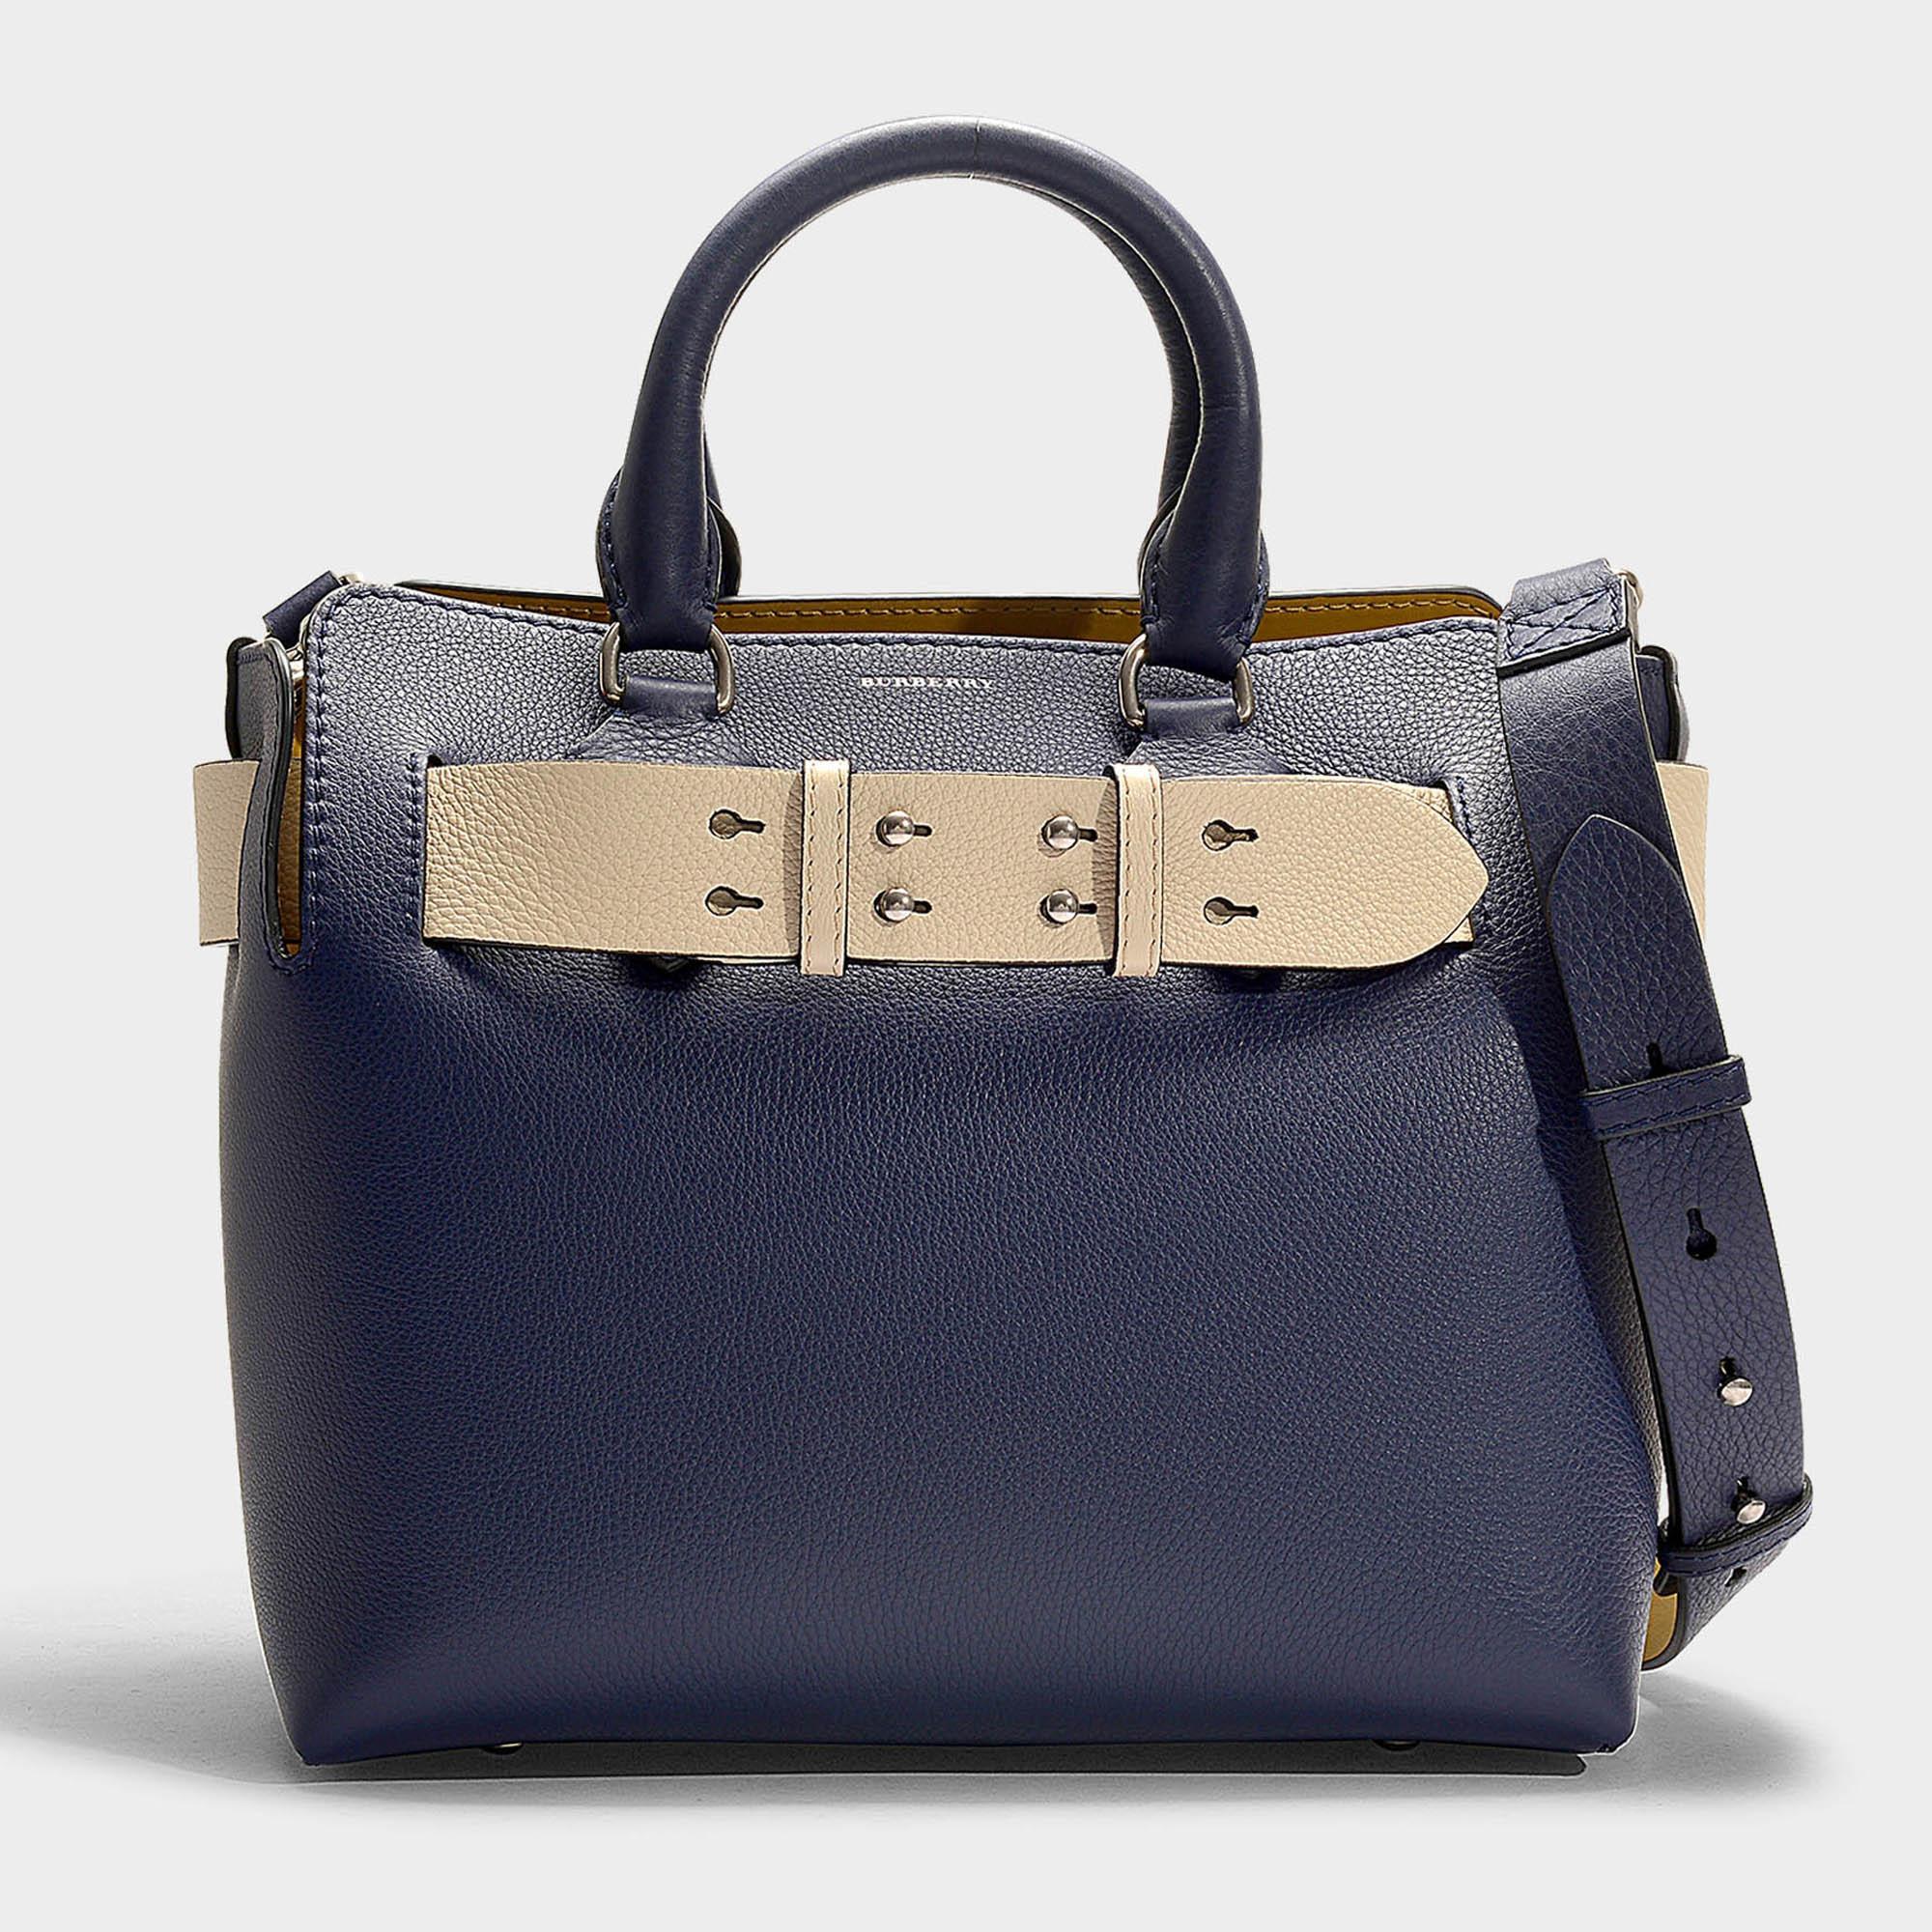 0ecaf3738107 Burberry - The Small Belt Bag In Regency Blue Calfskin - Lyst. View  fullscreen